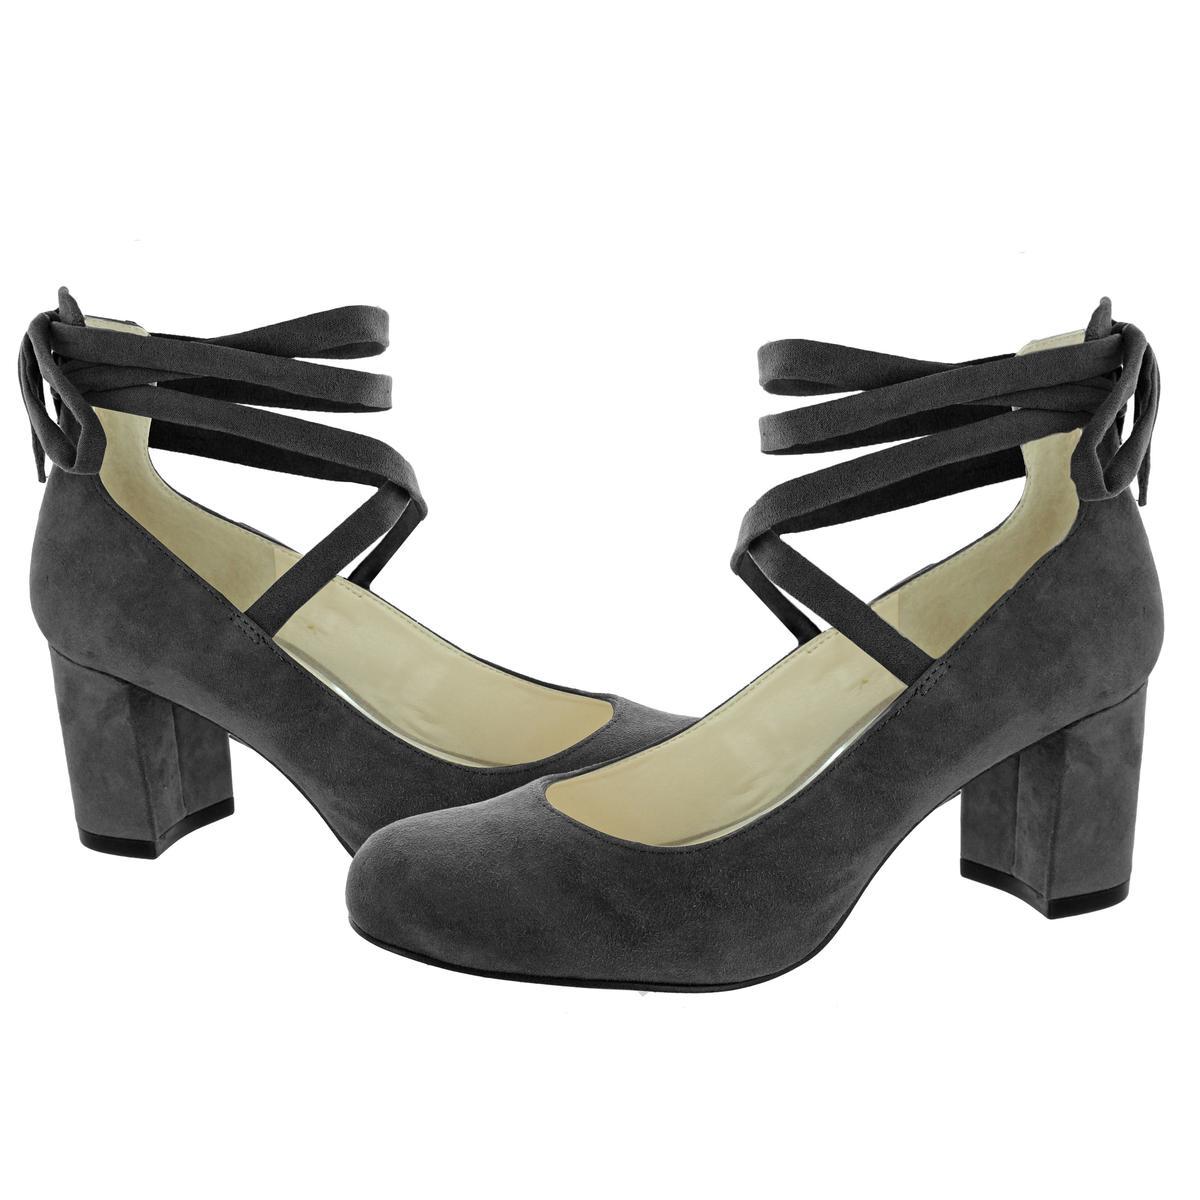 Jessica-Simpson-Venya-Women-039-s-Block-Heel-Lace-Pumps-Dress-Shoes thumbnail 4